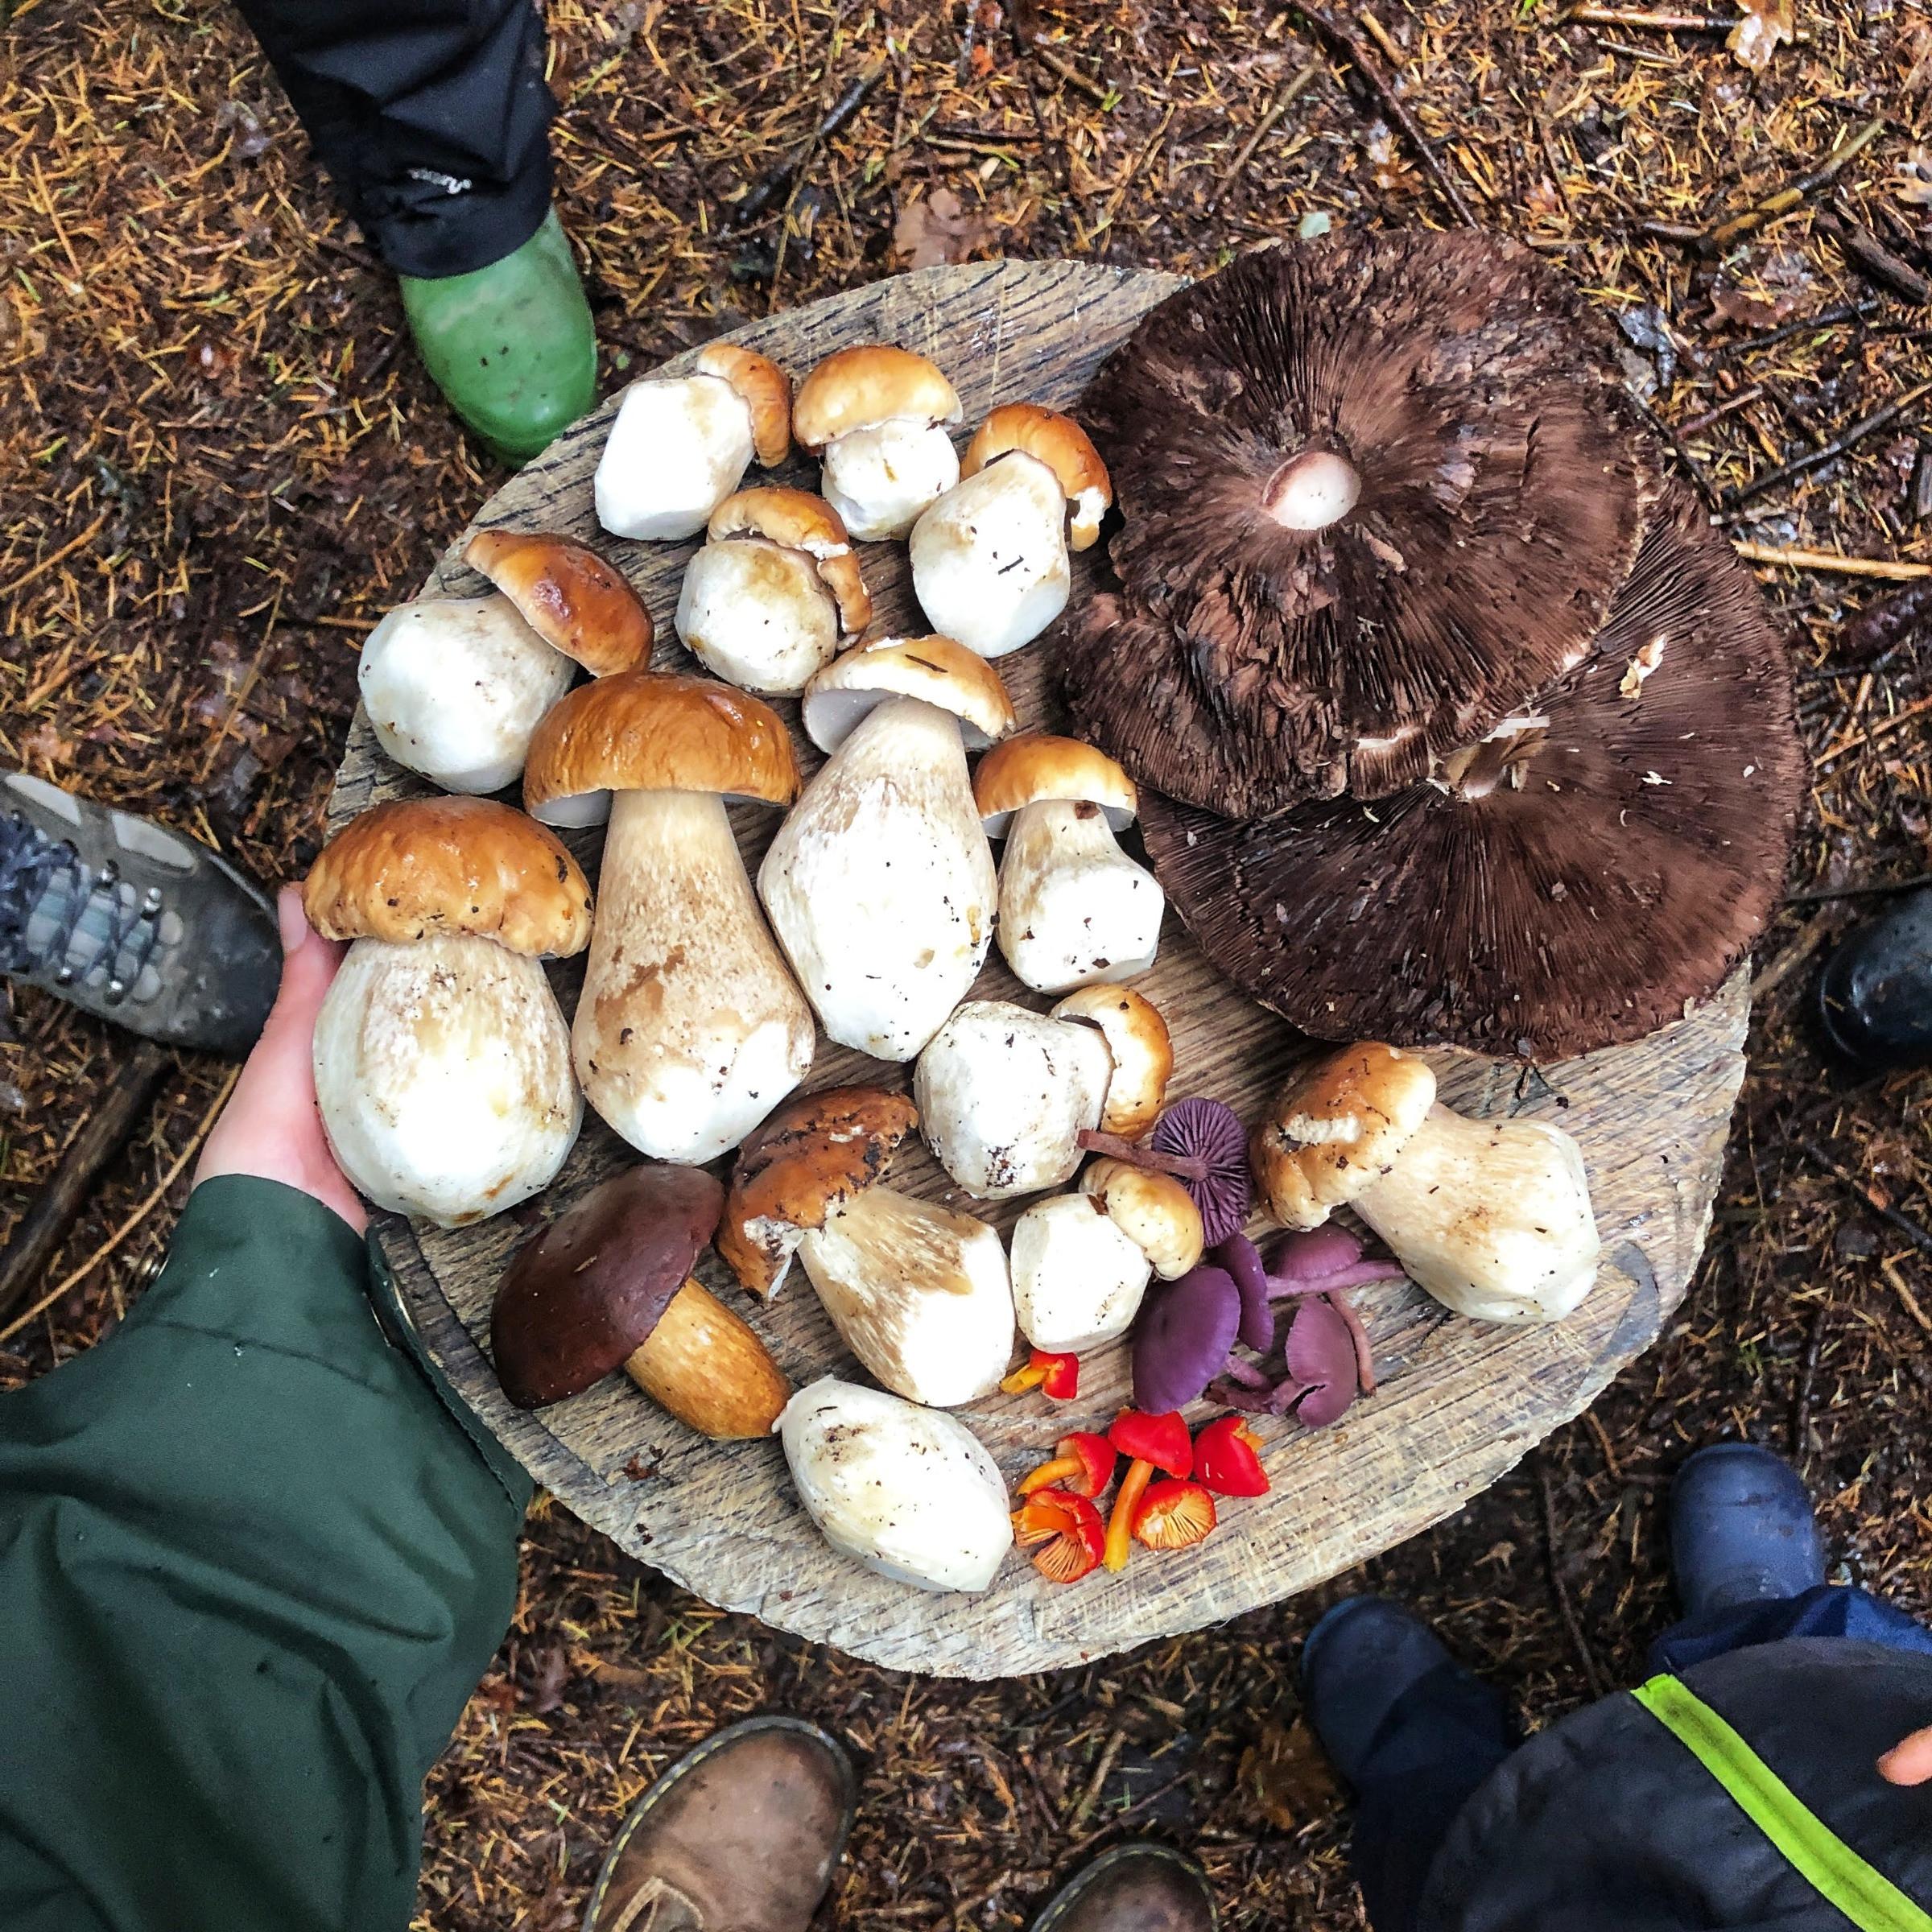 Mushroom Hunting Workshop